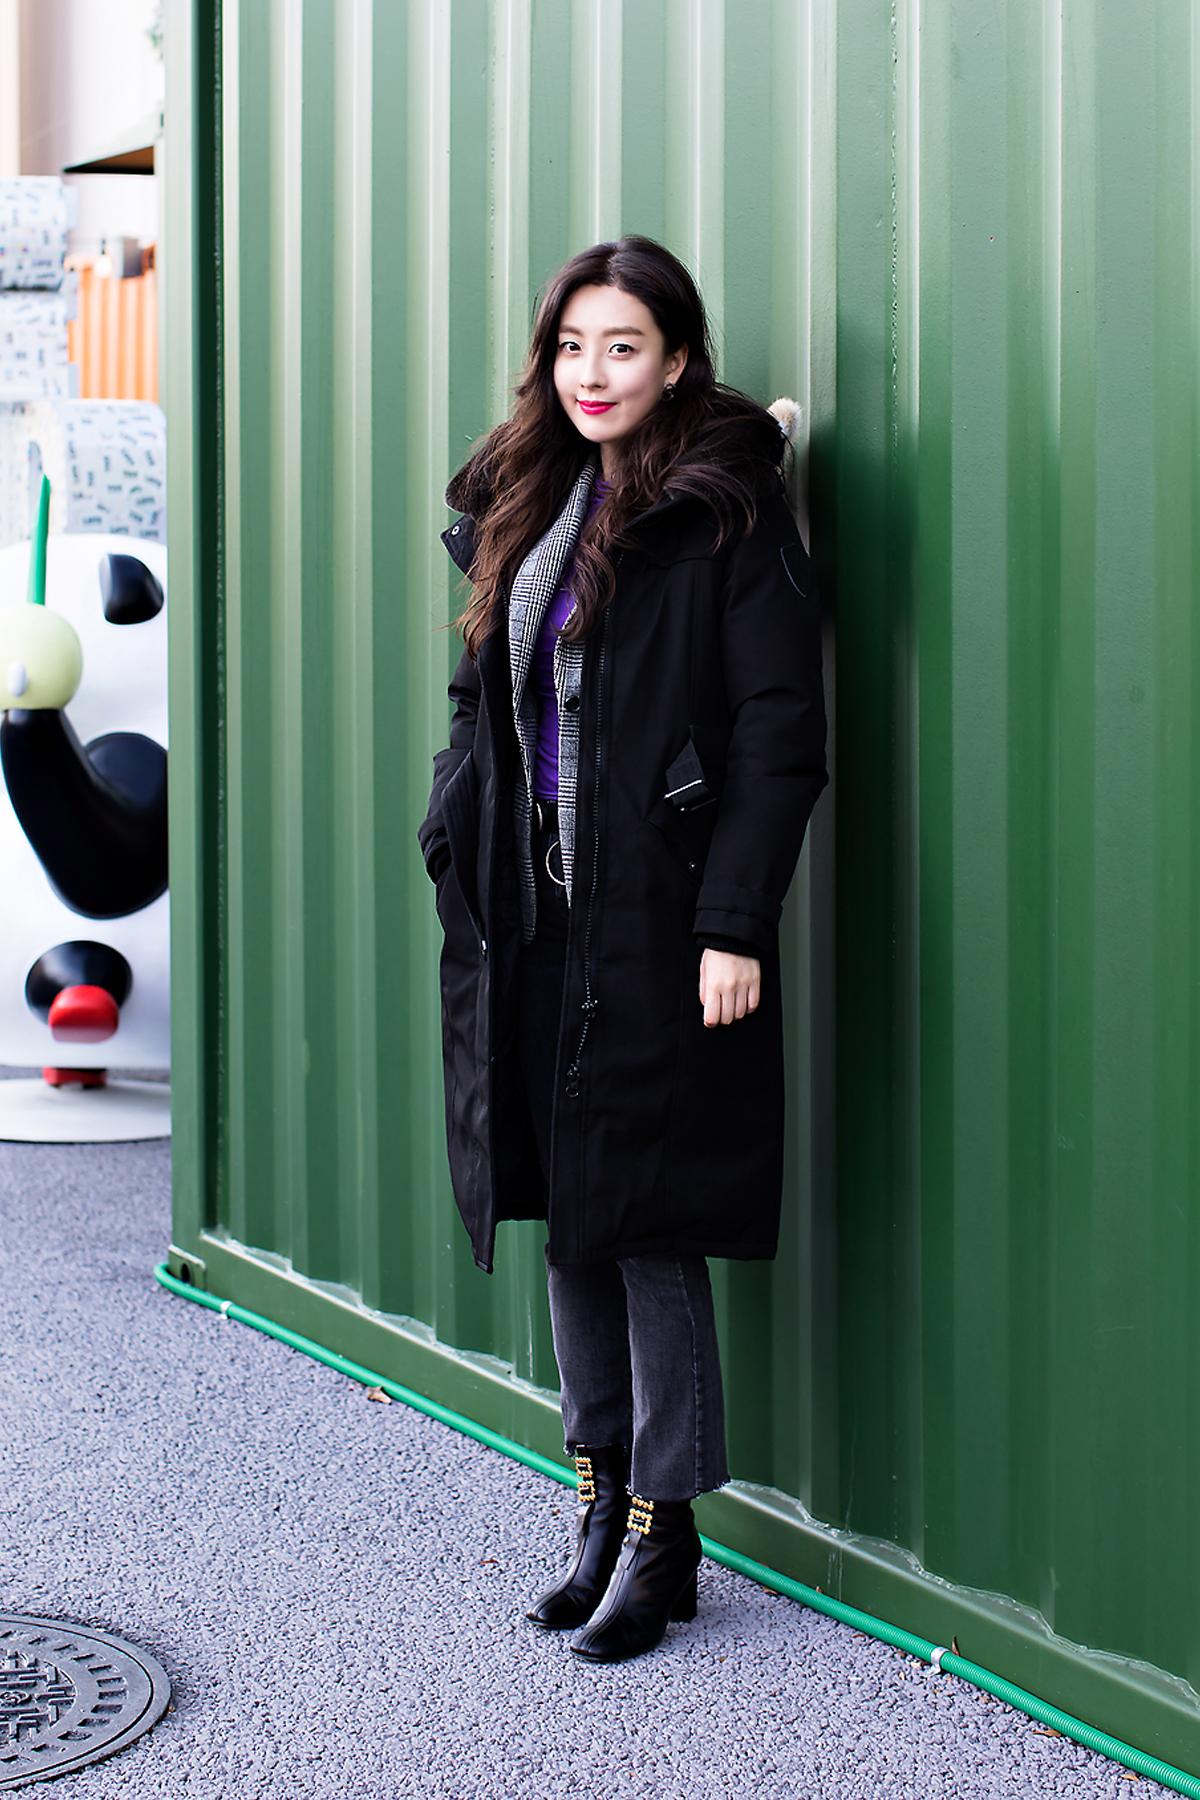 Byun Youngsun, Street Fashion 2017 in SEOUL.jpg